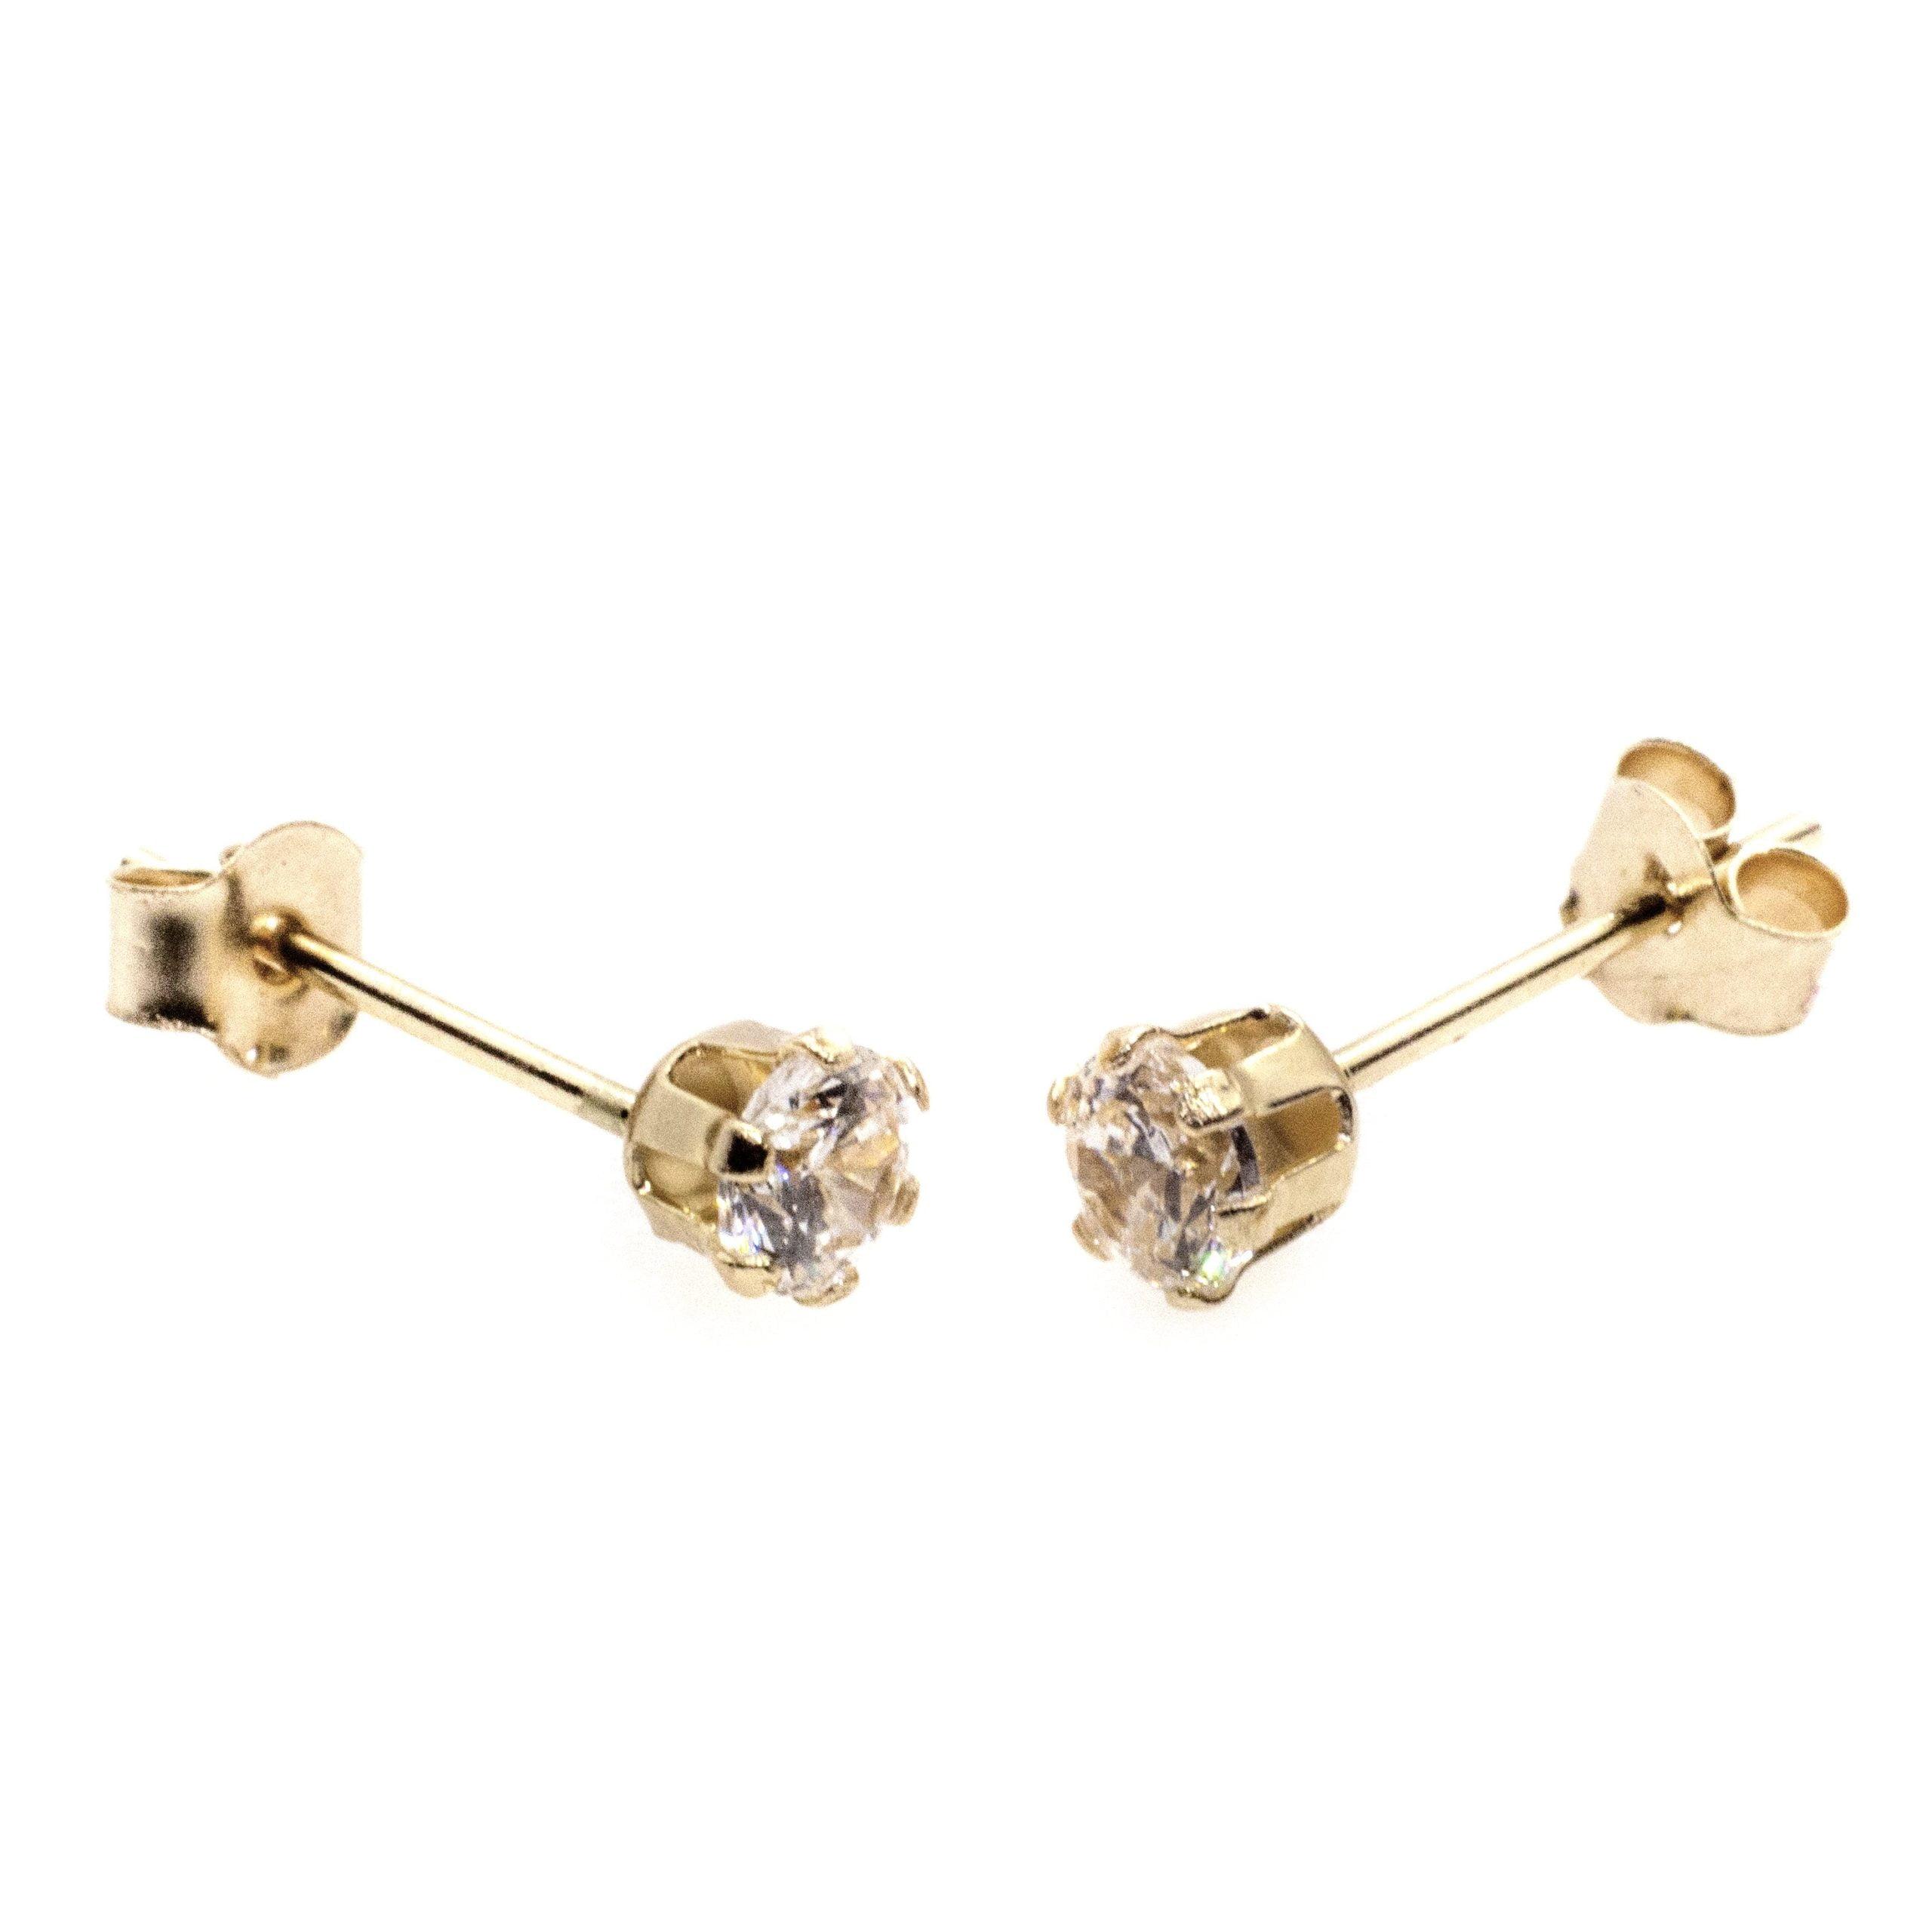 4mm CZ stud earrings 9ct yellow gold alt 3